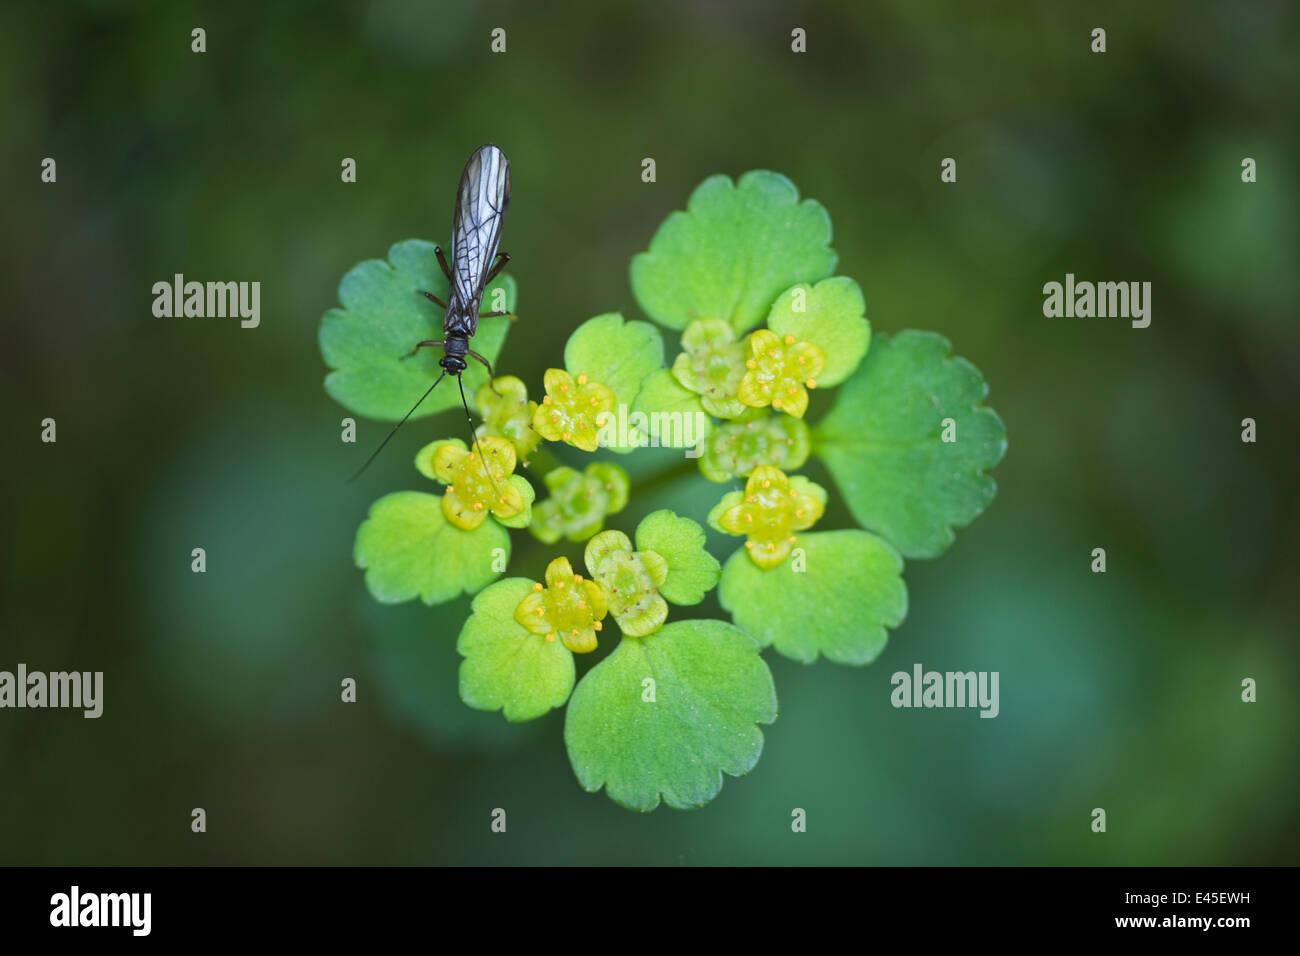 Stone fly (Leuctra fusca) on Alternate-leaved Golden Saxifrage (Chrysosplenium alternifolium)    Zelske Jame, Skocjan - Stock Image